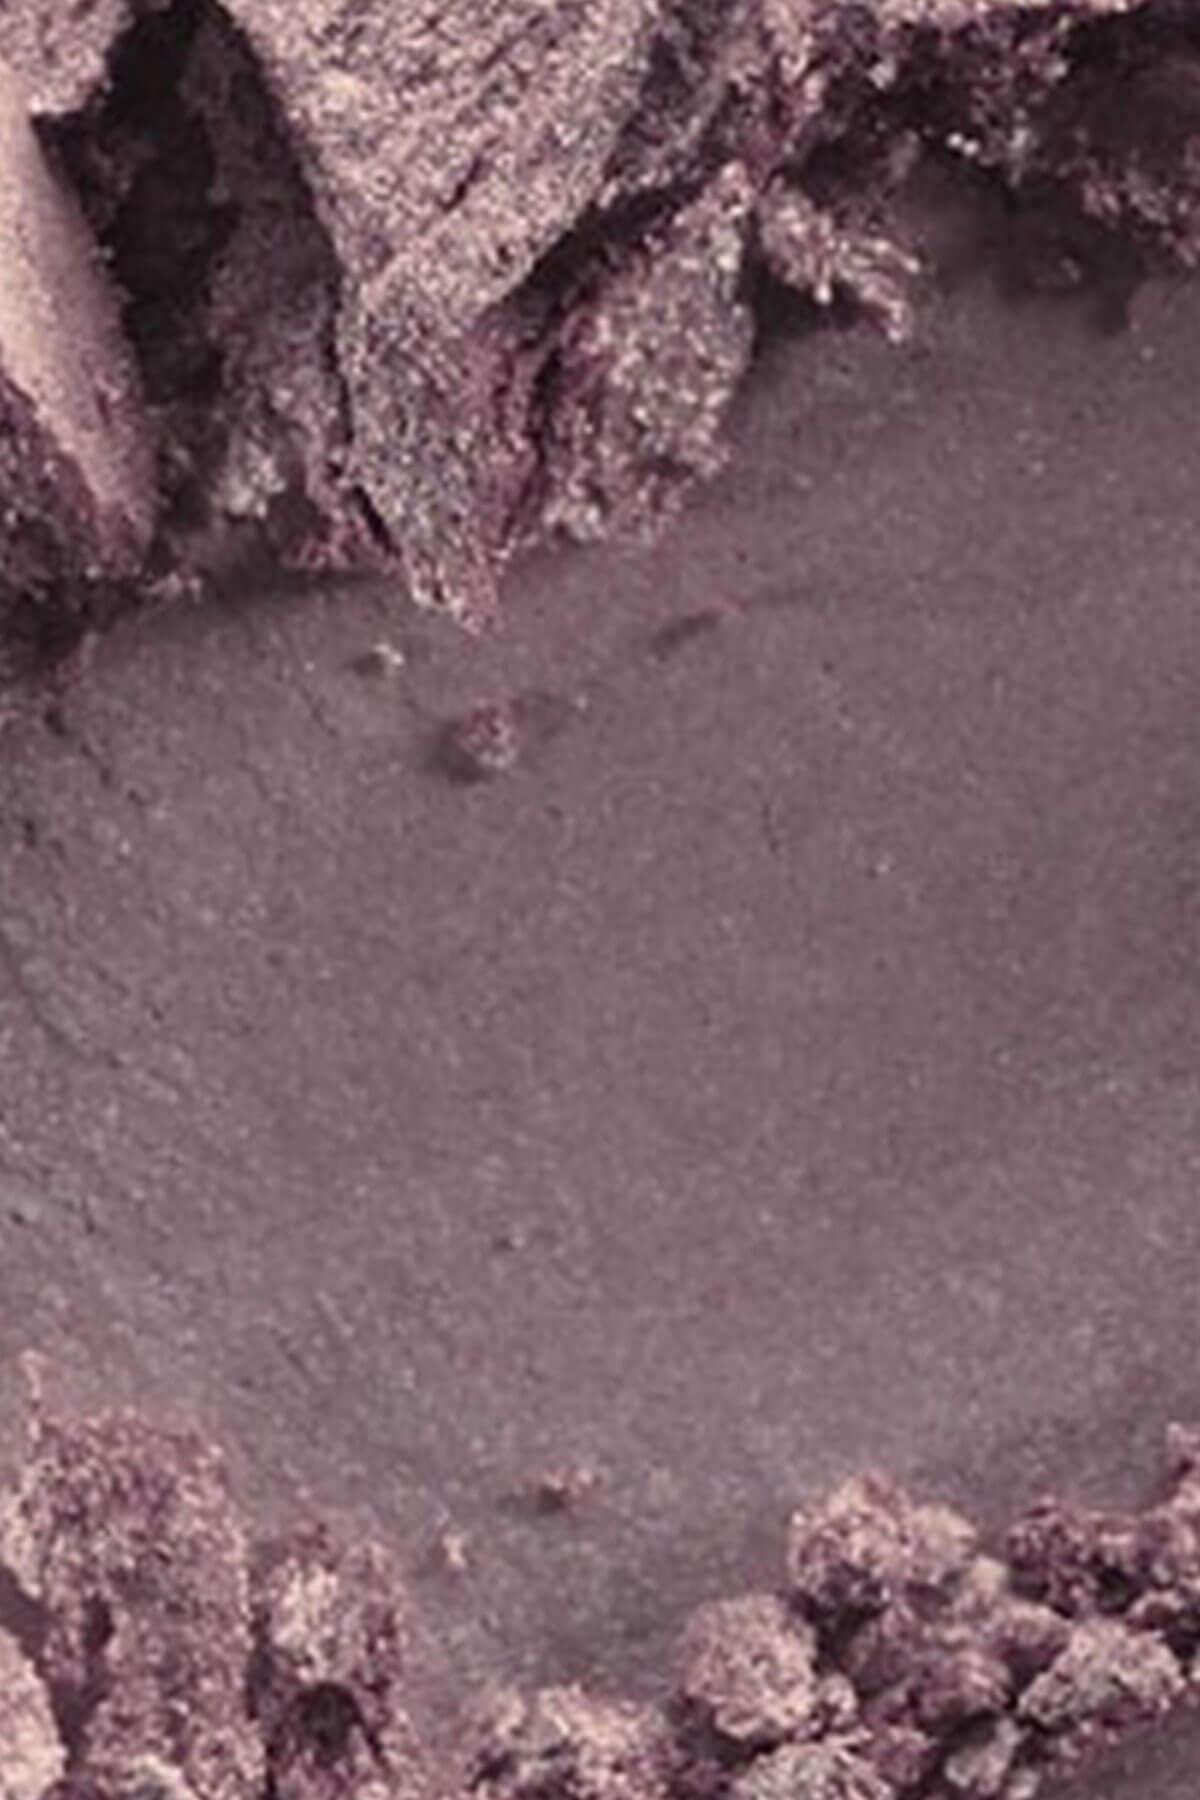 M.A.C Göz Farı - Refill Far Satin Taupe 1.5 g 773602965977 2